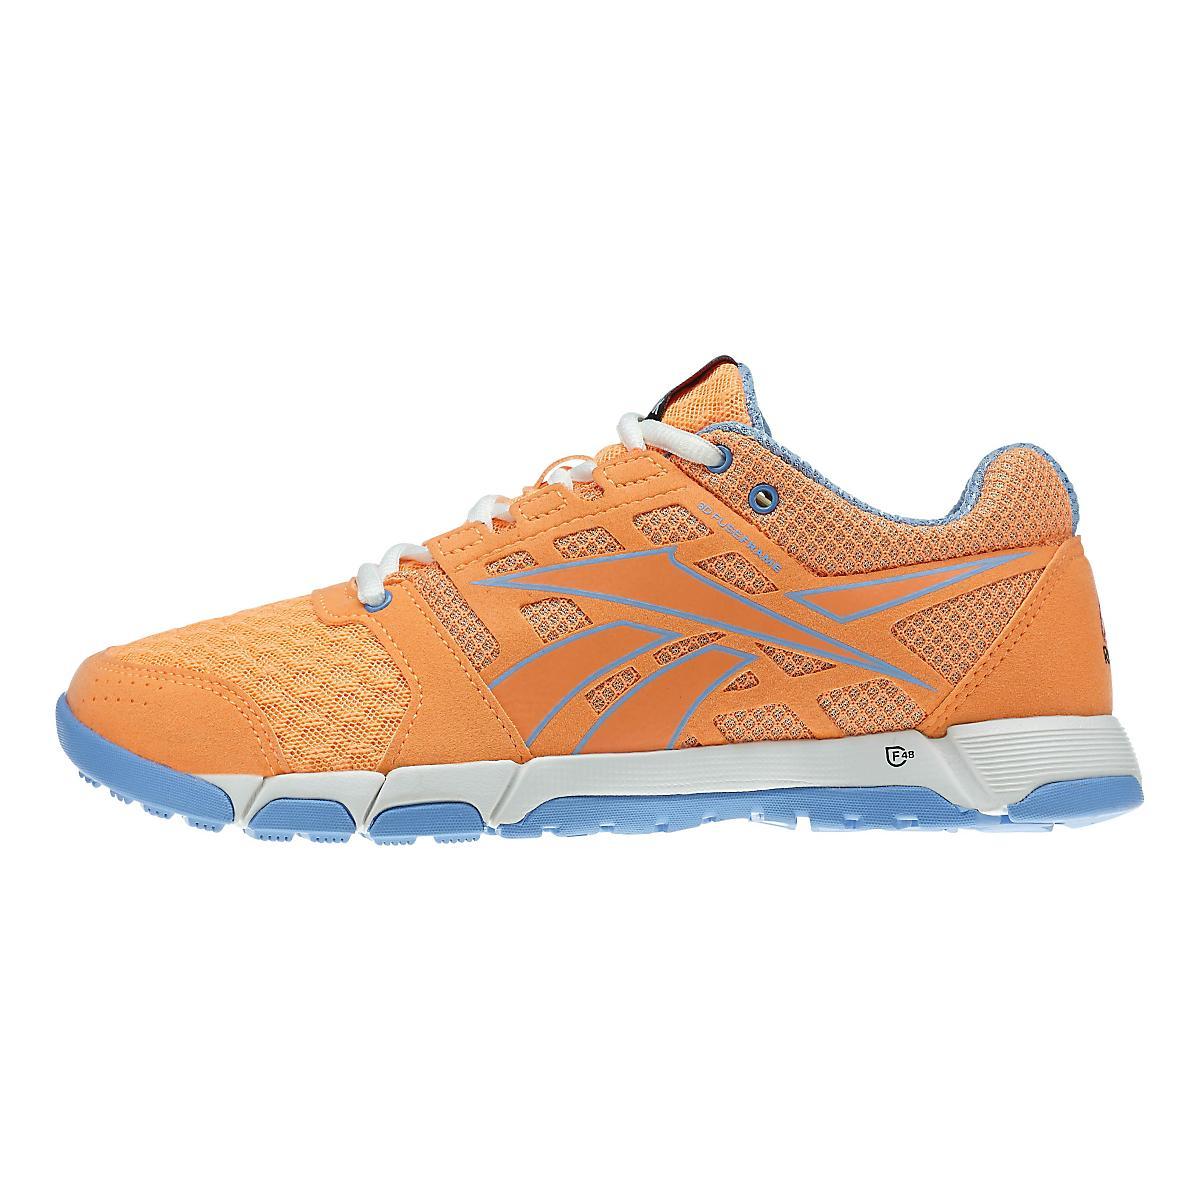 c8ed78c5985 Womens Reebok ONE Trainer 1.0 Cross Training Shoe at Road Runner Sports